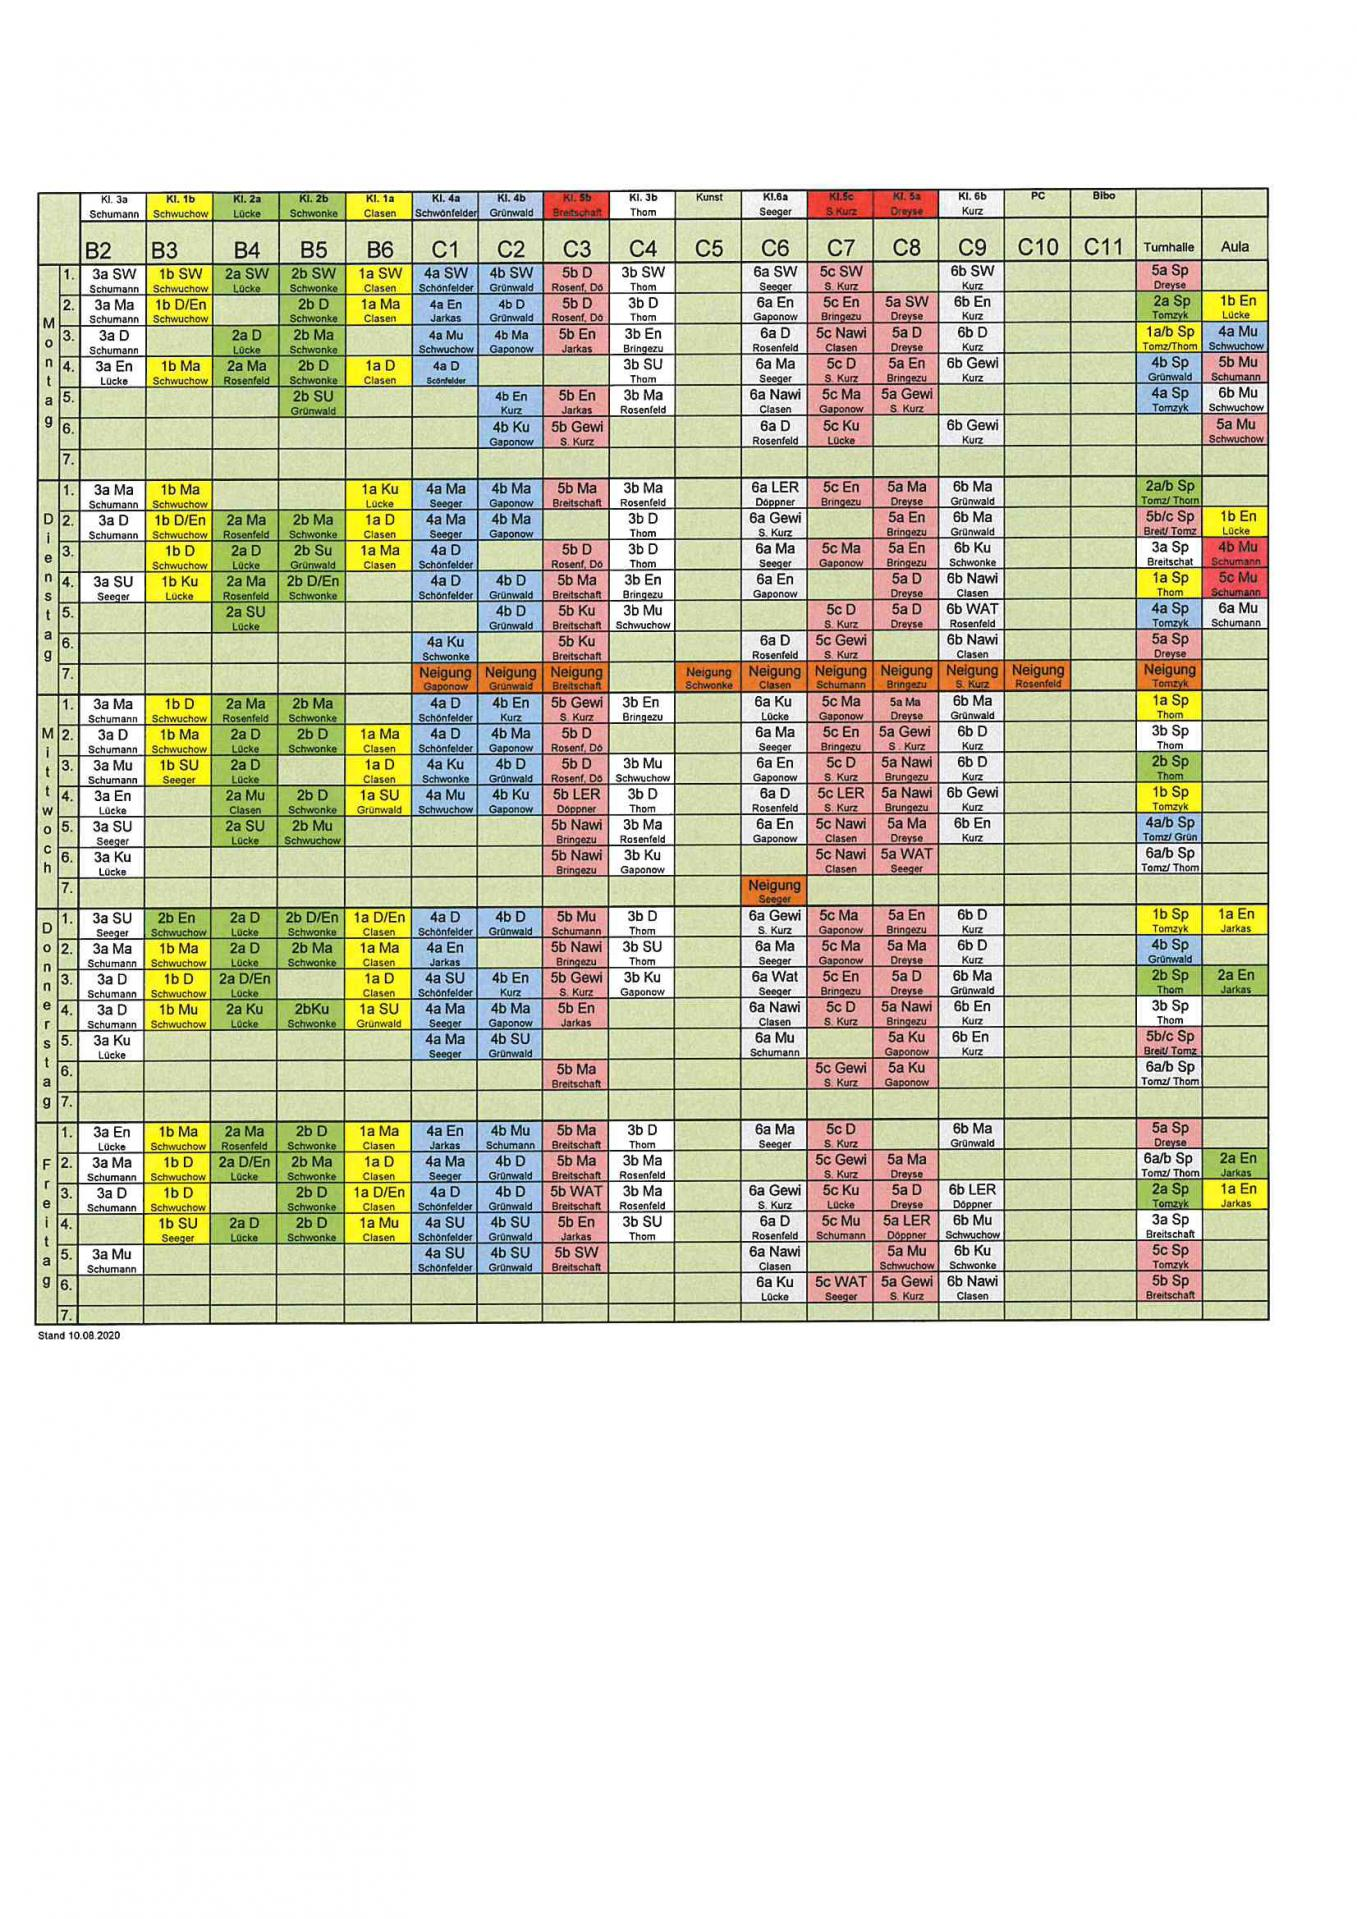 Stundenplan 1. SHJ 2020/21